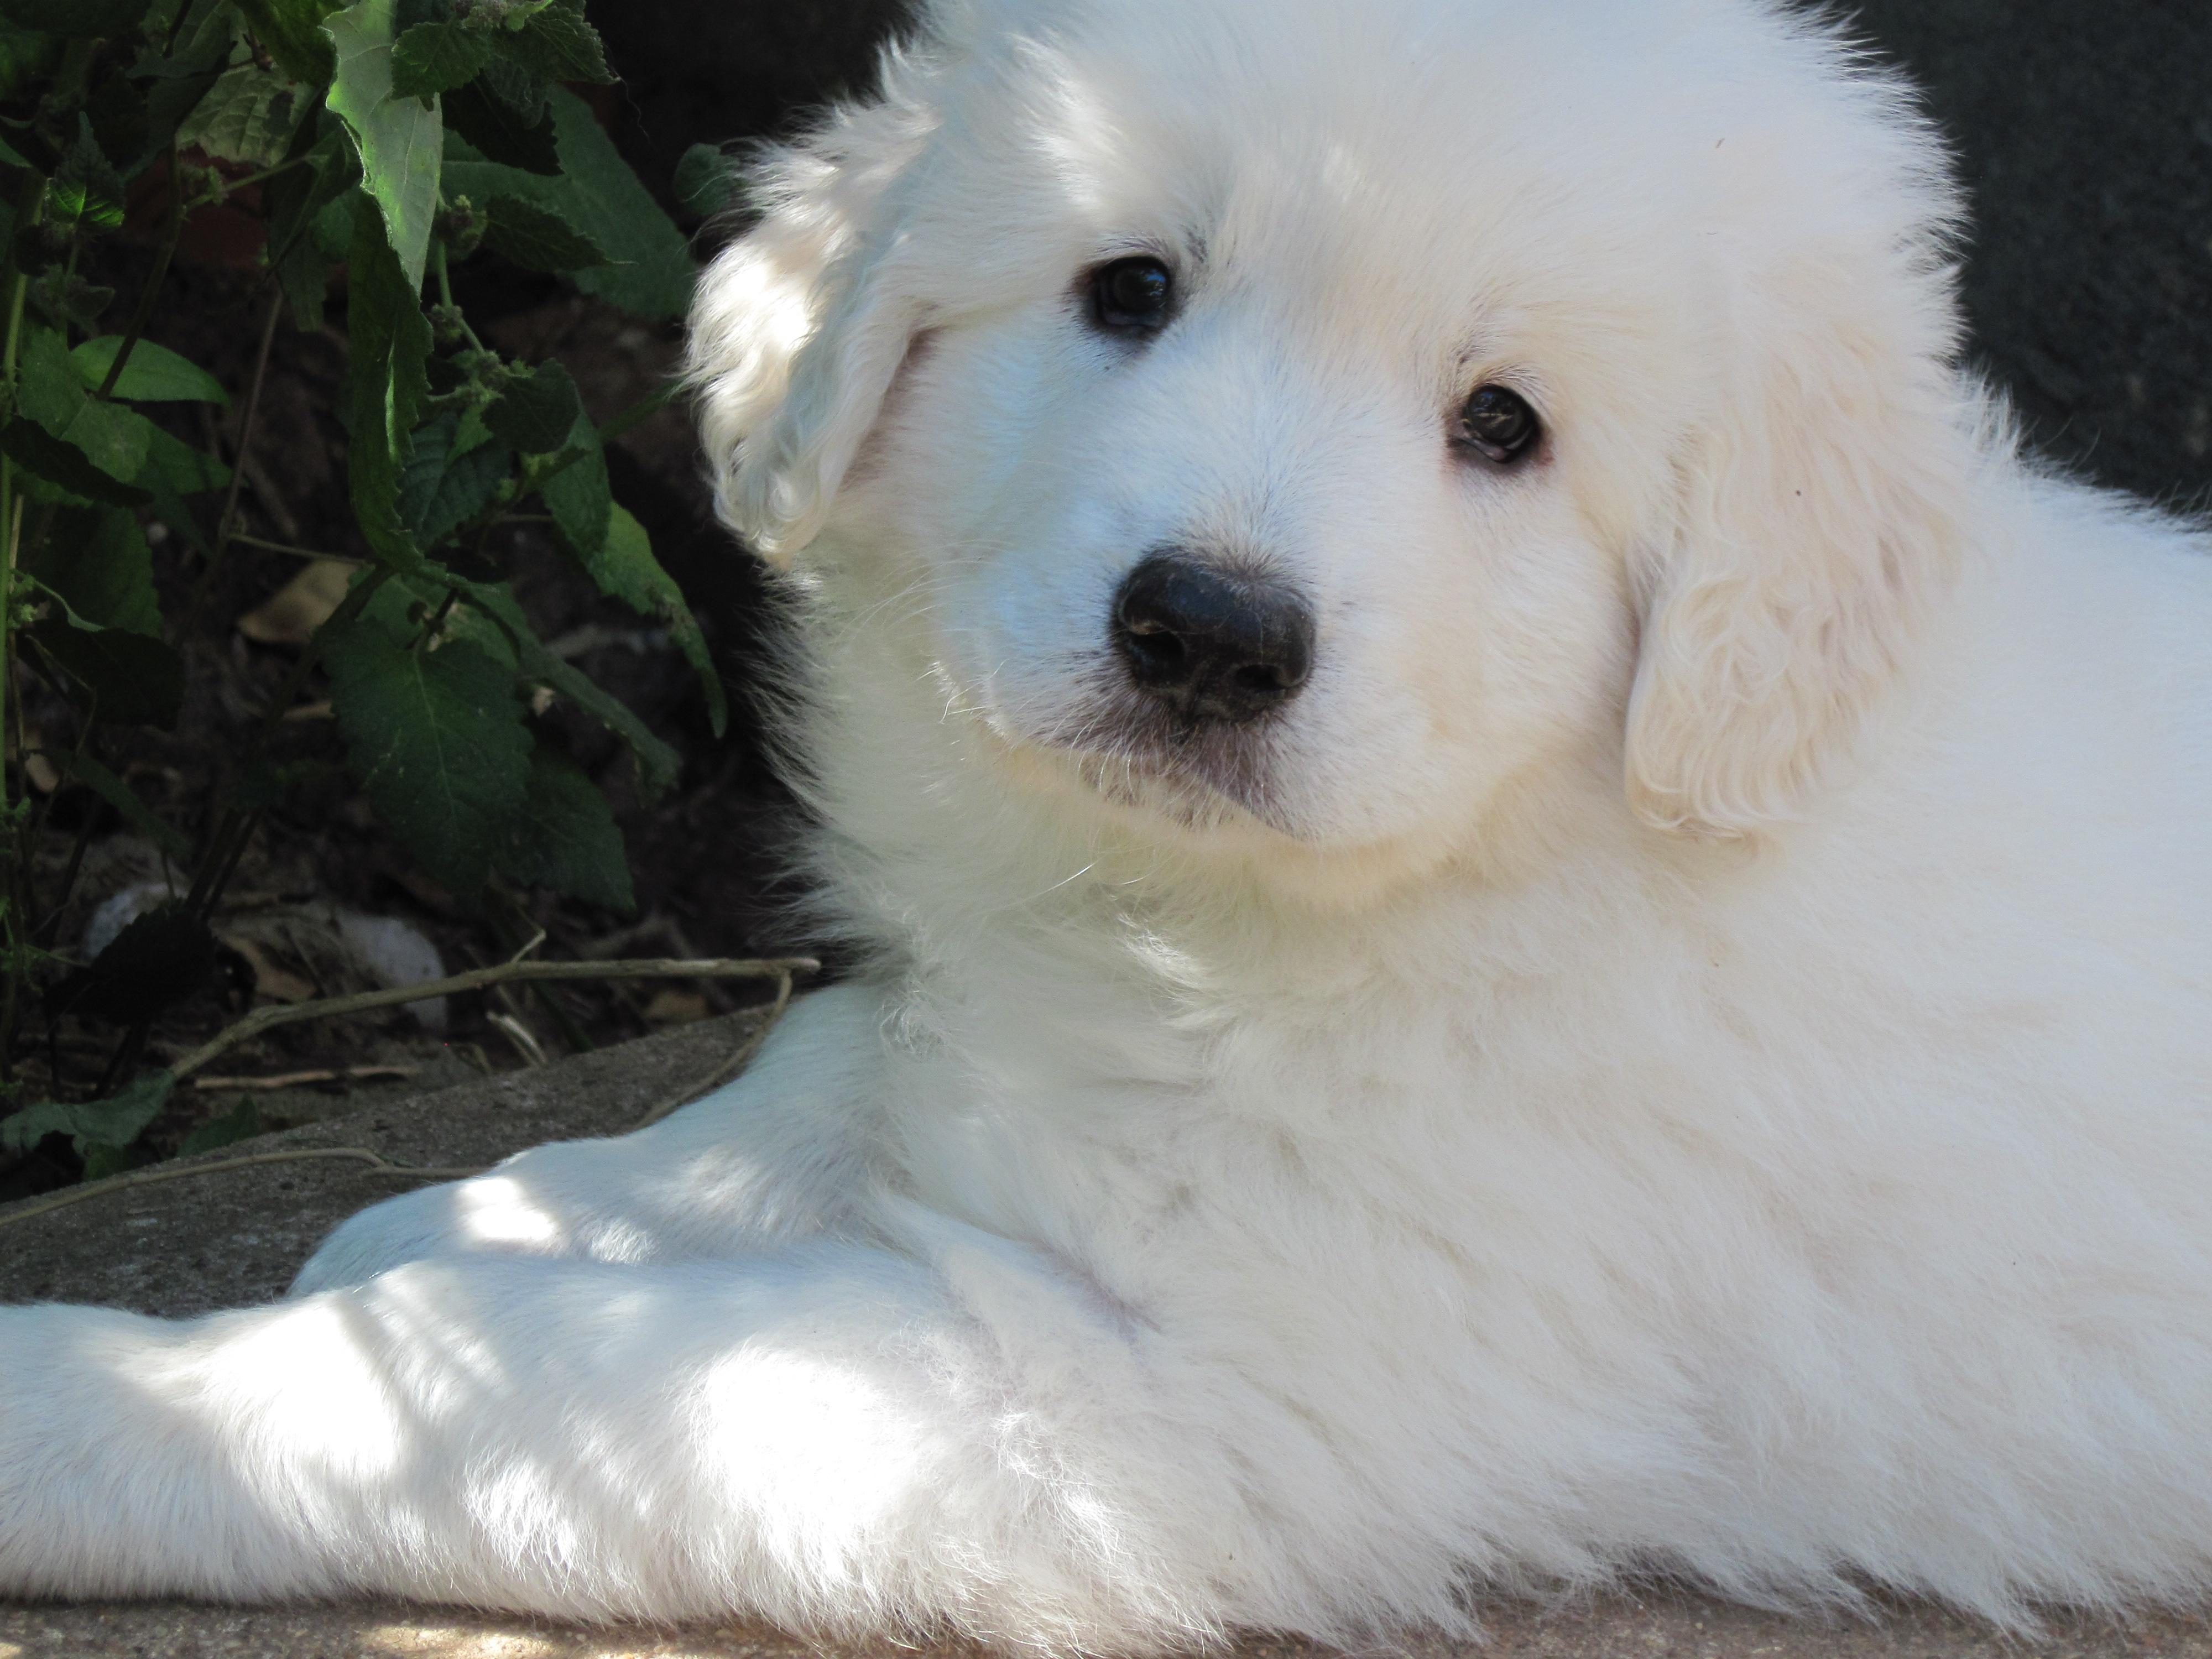 Slovak Cuvac Dog: Slovak Slovak Cuvac Puppy Breed